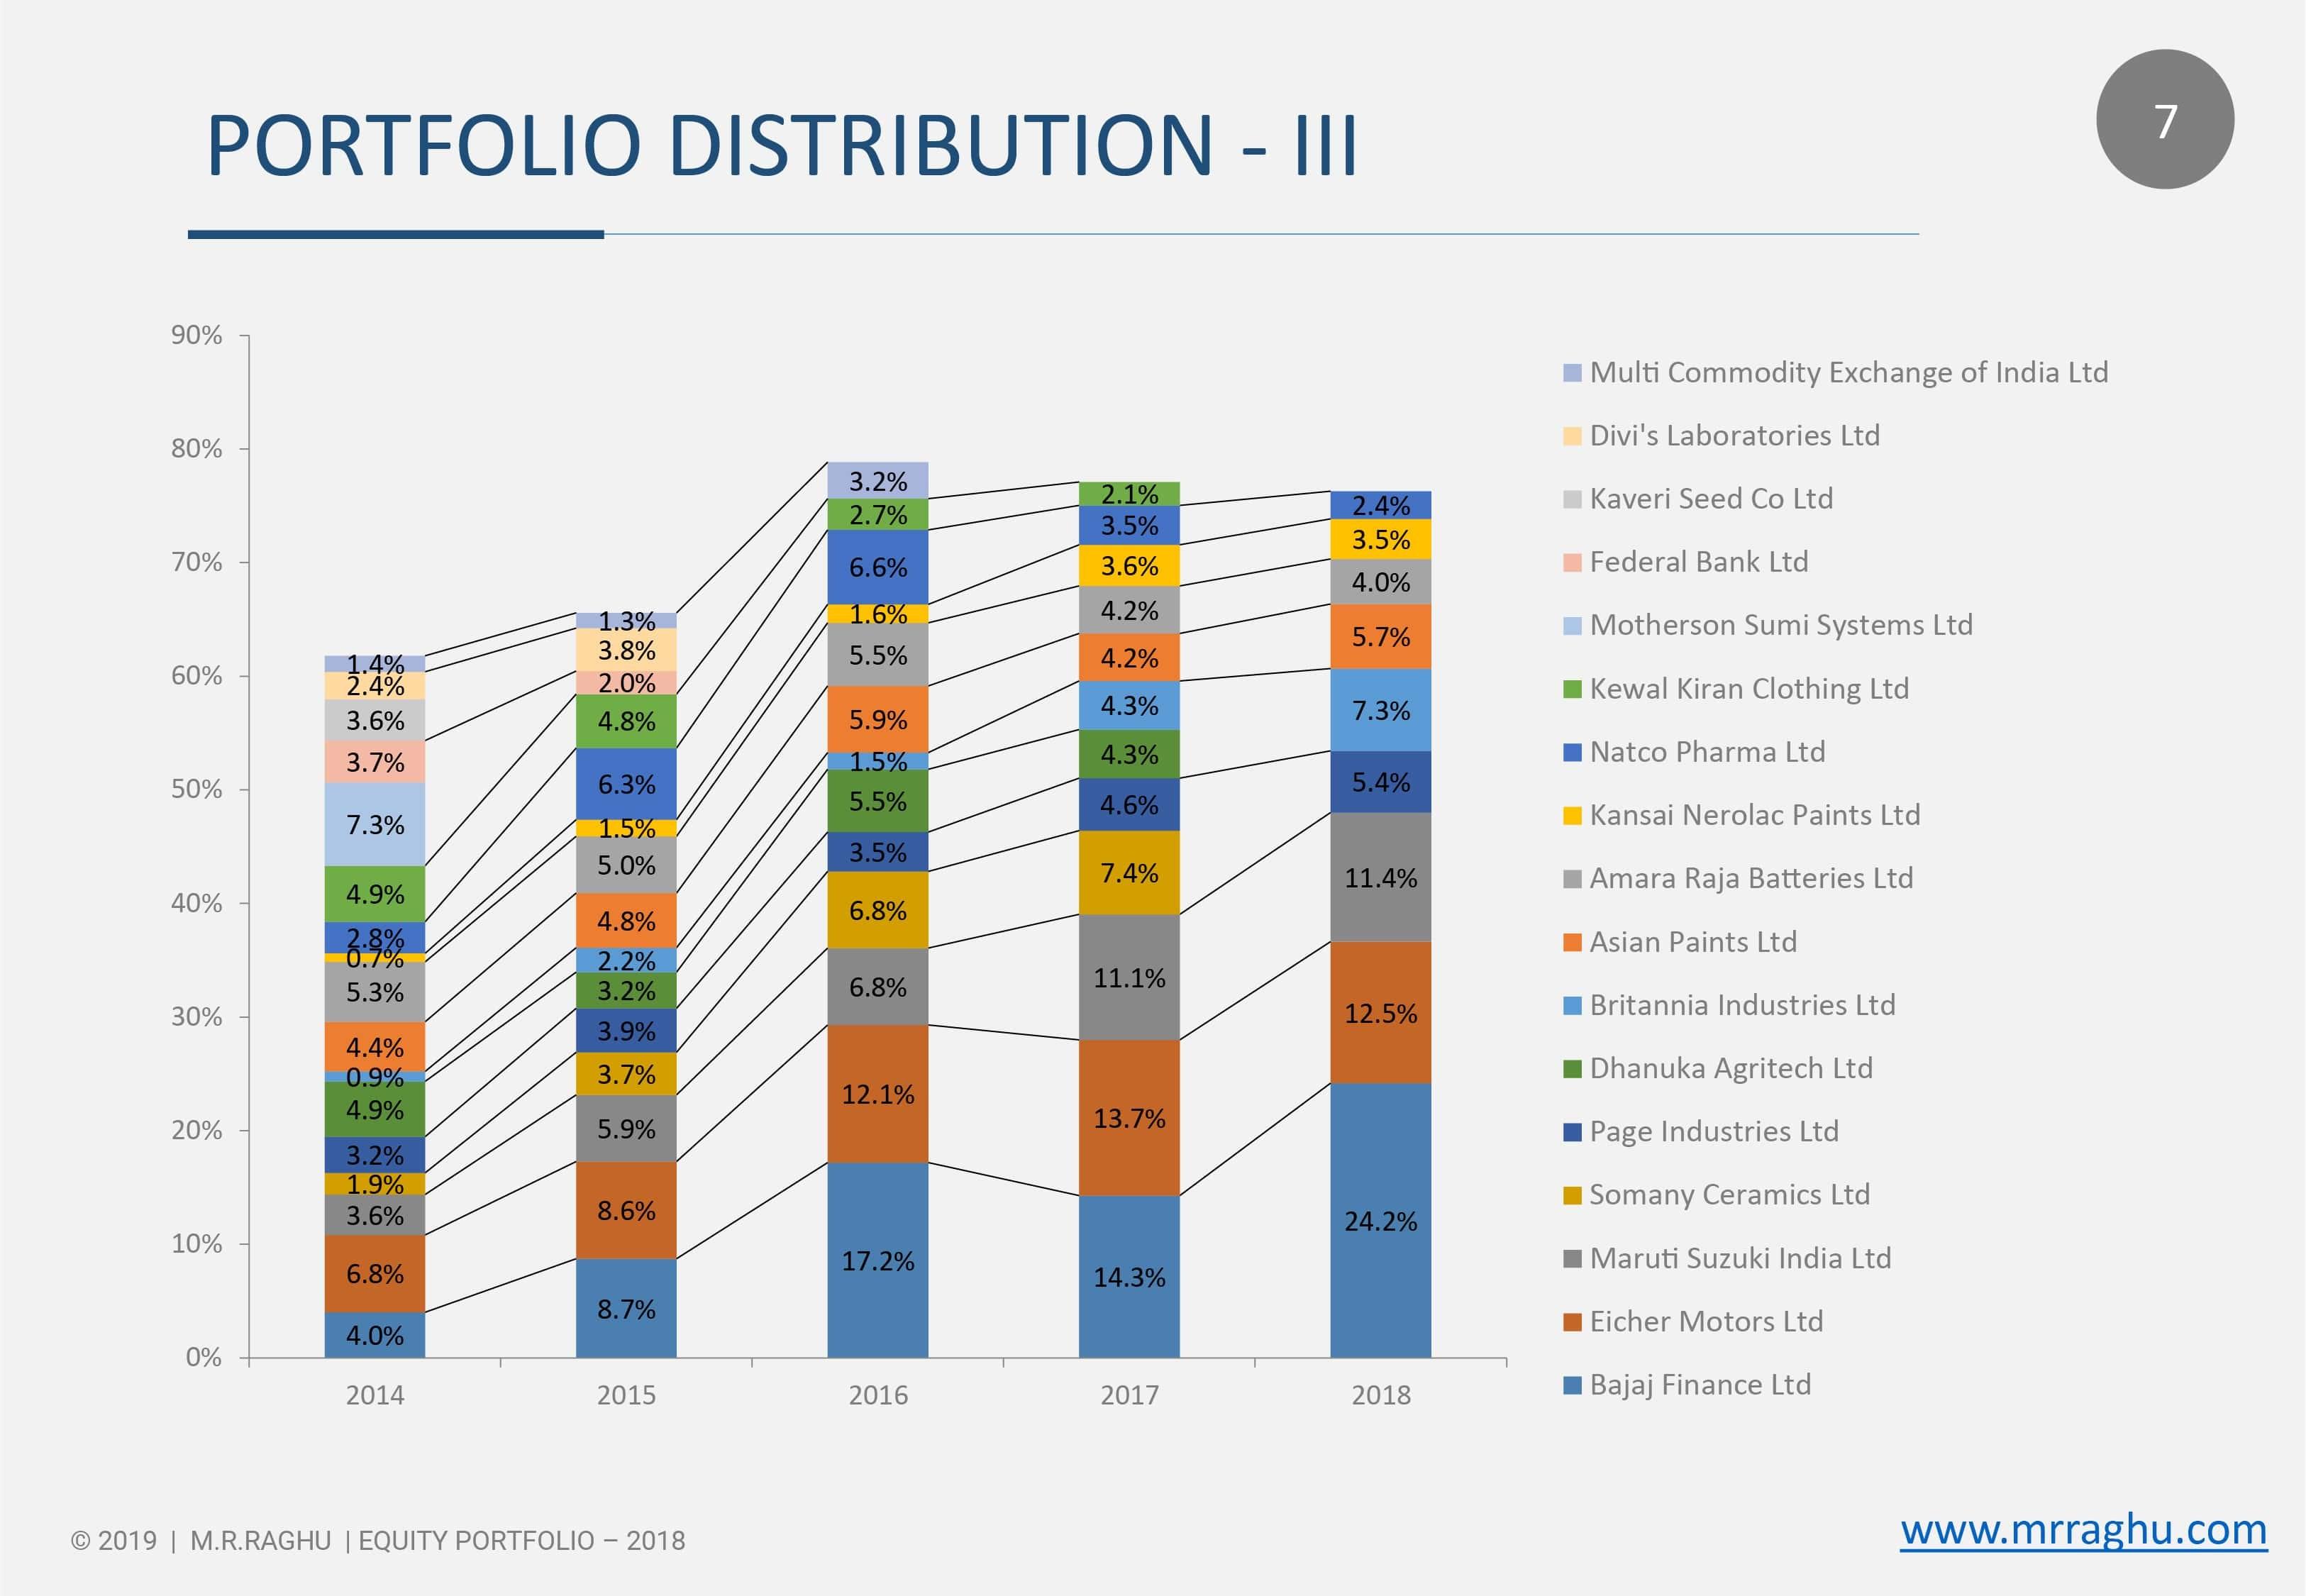 PORTFOLIO DISTRIBUTION - III - 2018